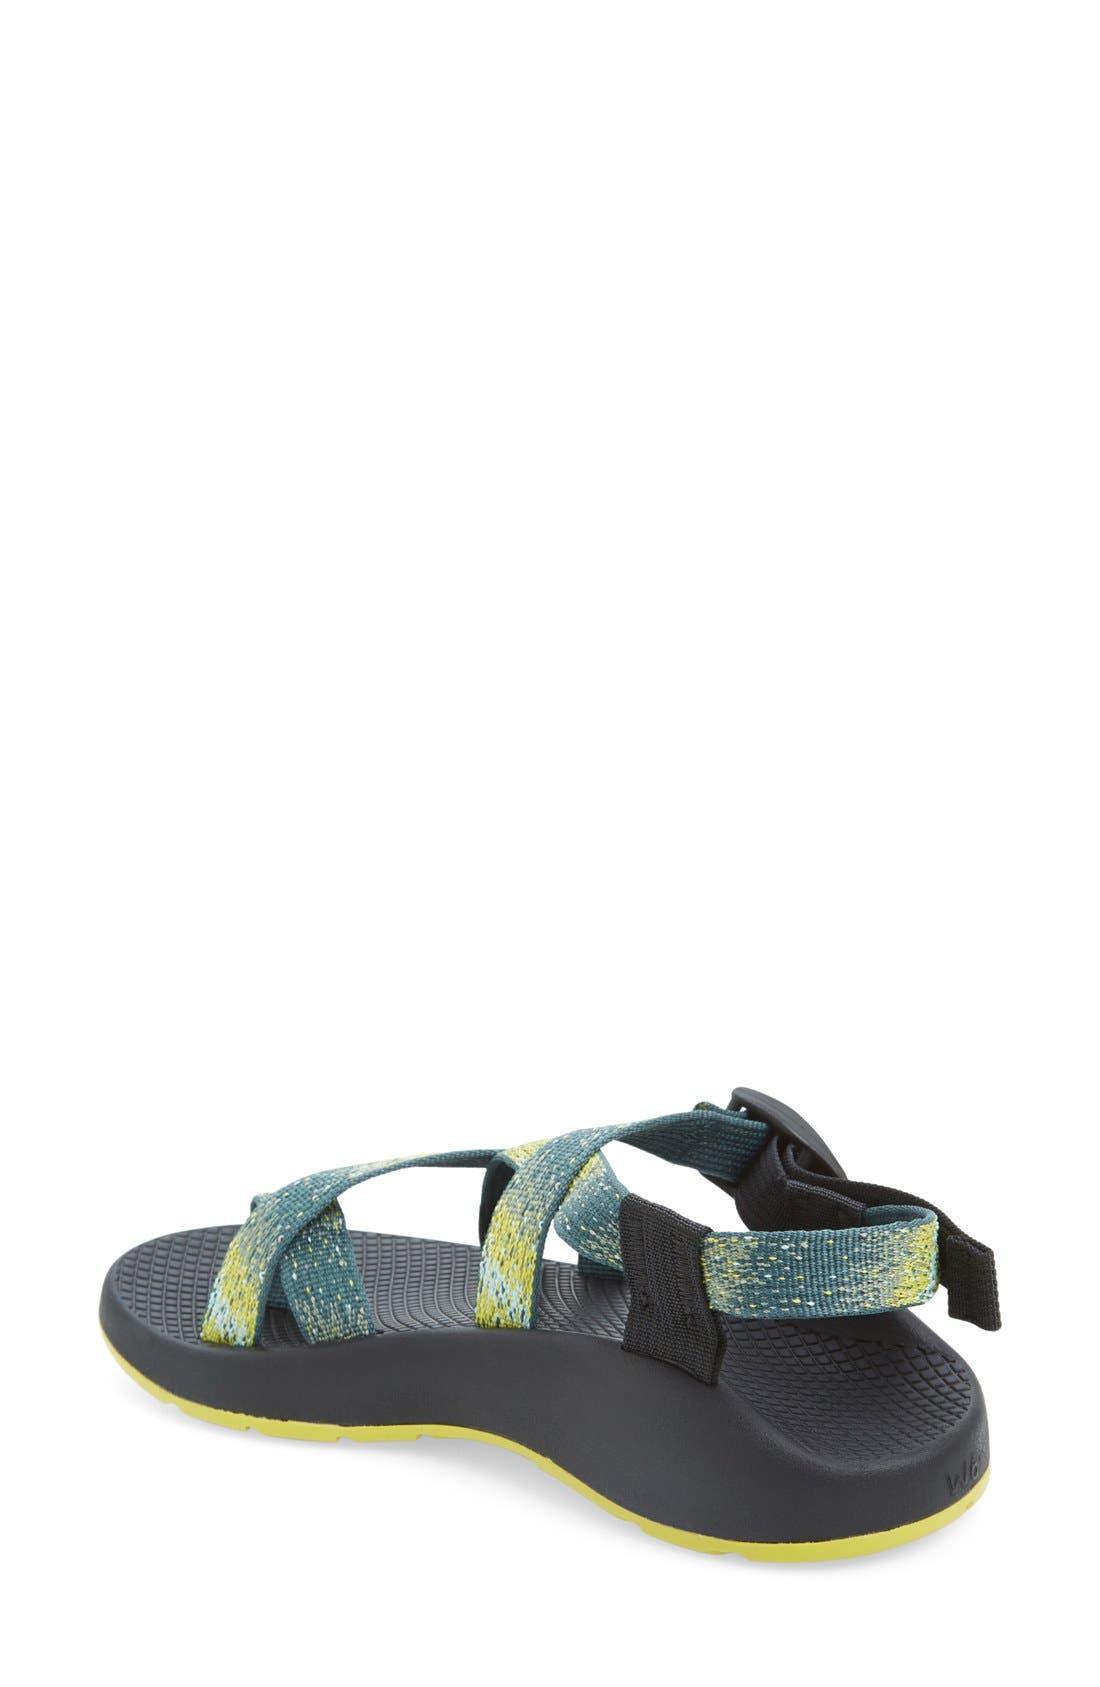 Alternate Image 2  - Chaco 'Z2 Yampa' Sandal